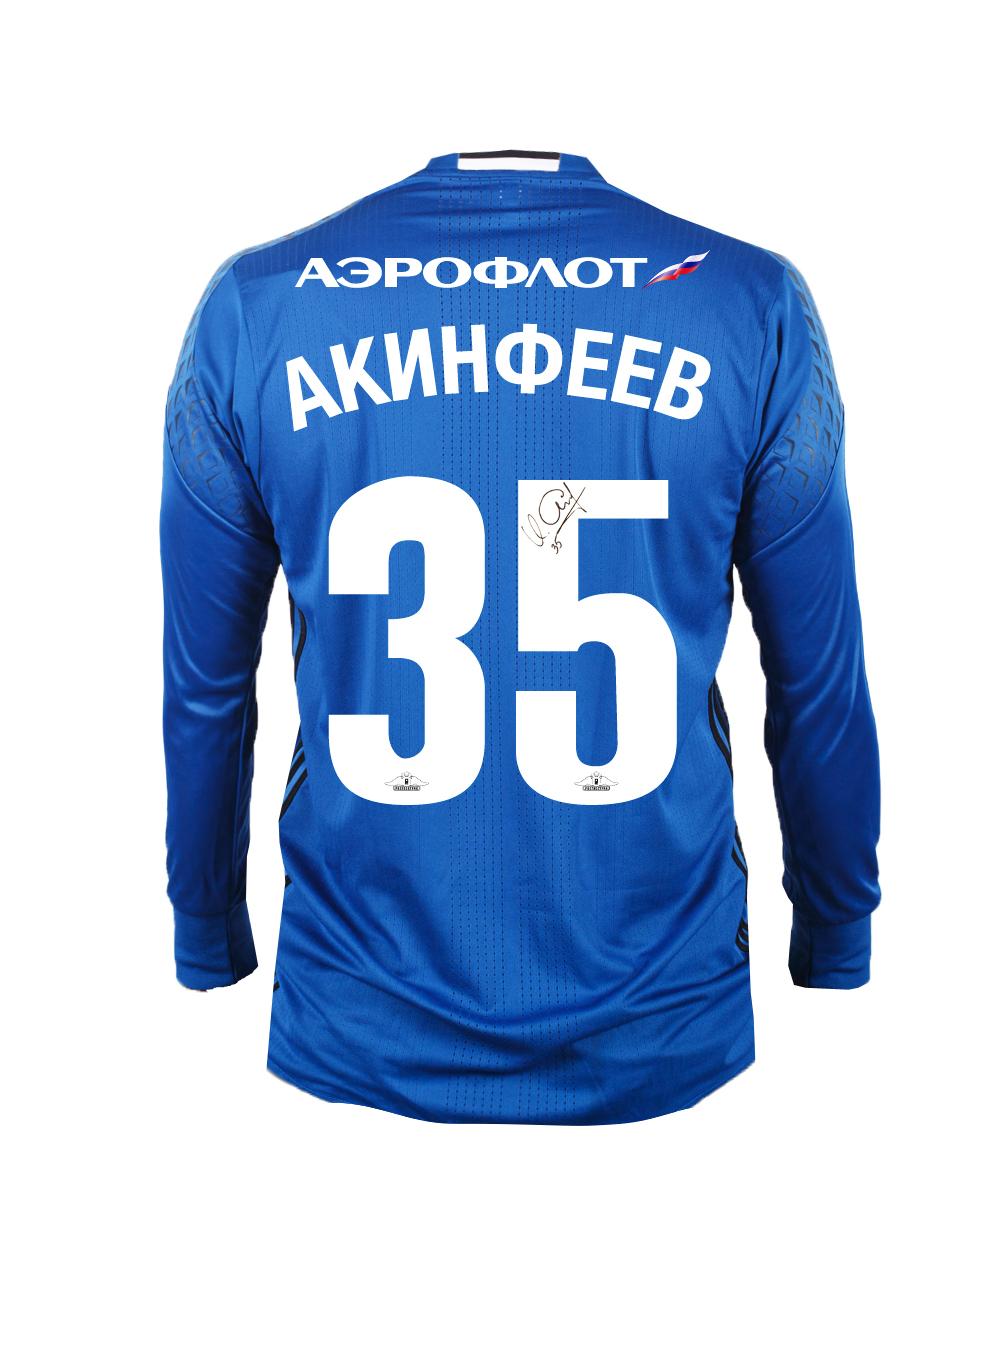 Вратарский свитер д/р, цвет синий с автографом АКИНФЕЕВА (6) фото